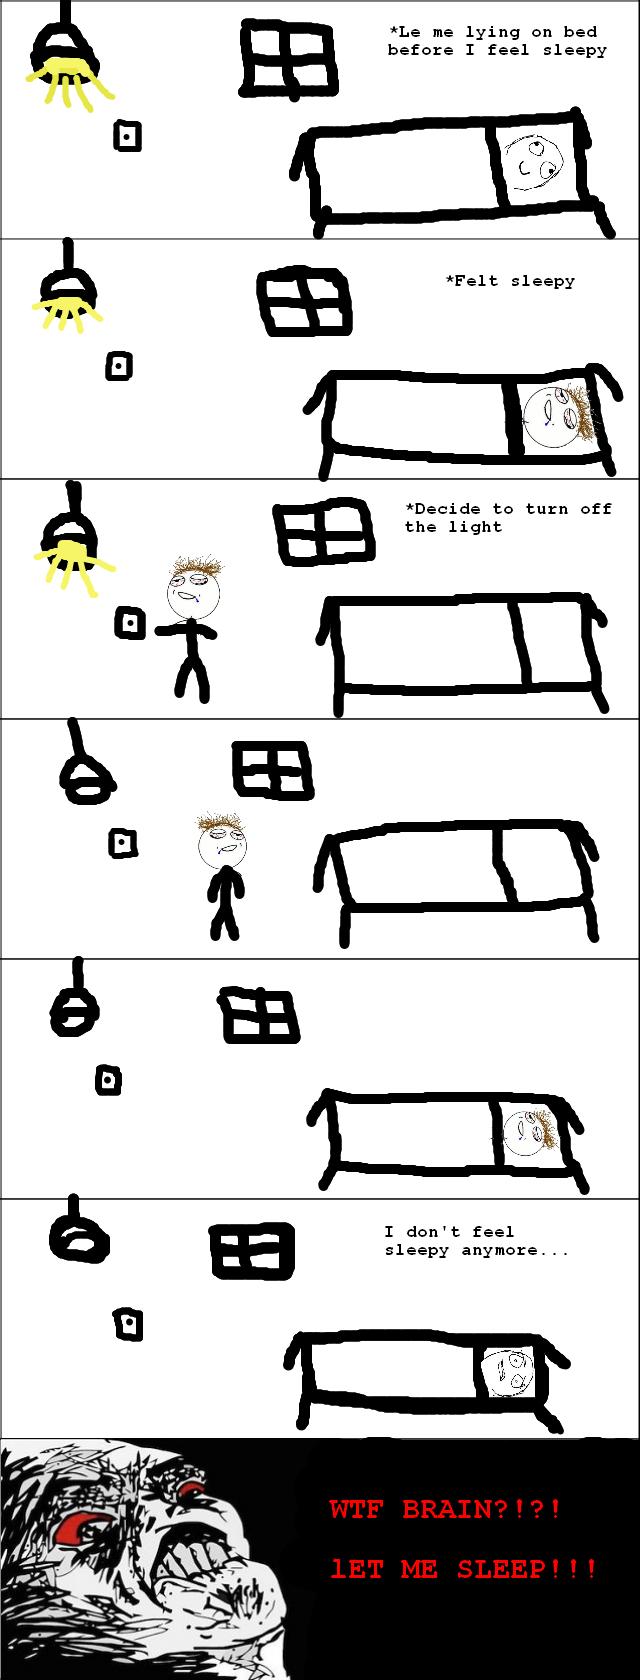 Brain fails. Don't skip this please!. Le me lying on bed before I feel sleepy Felt sleepy Decide to turn off the light; I don' t feel sleepy anymore...